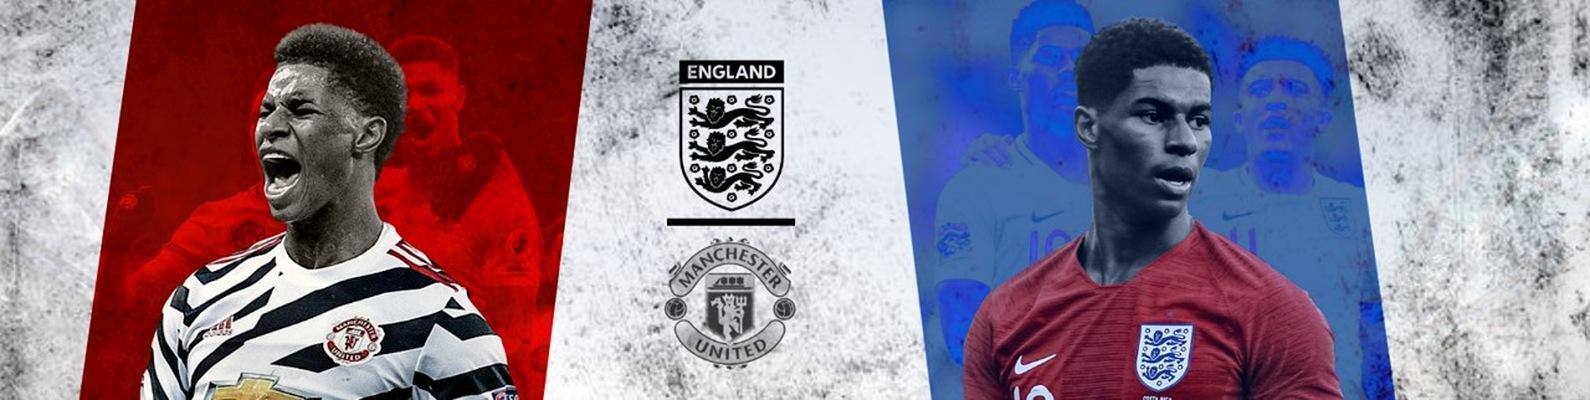 Marcus Rashford MBE | Маркус Рэшфорд | ВКонтакте